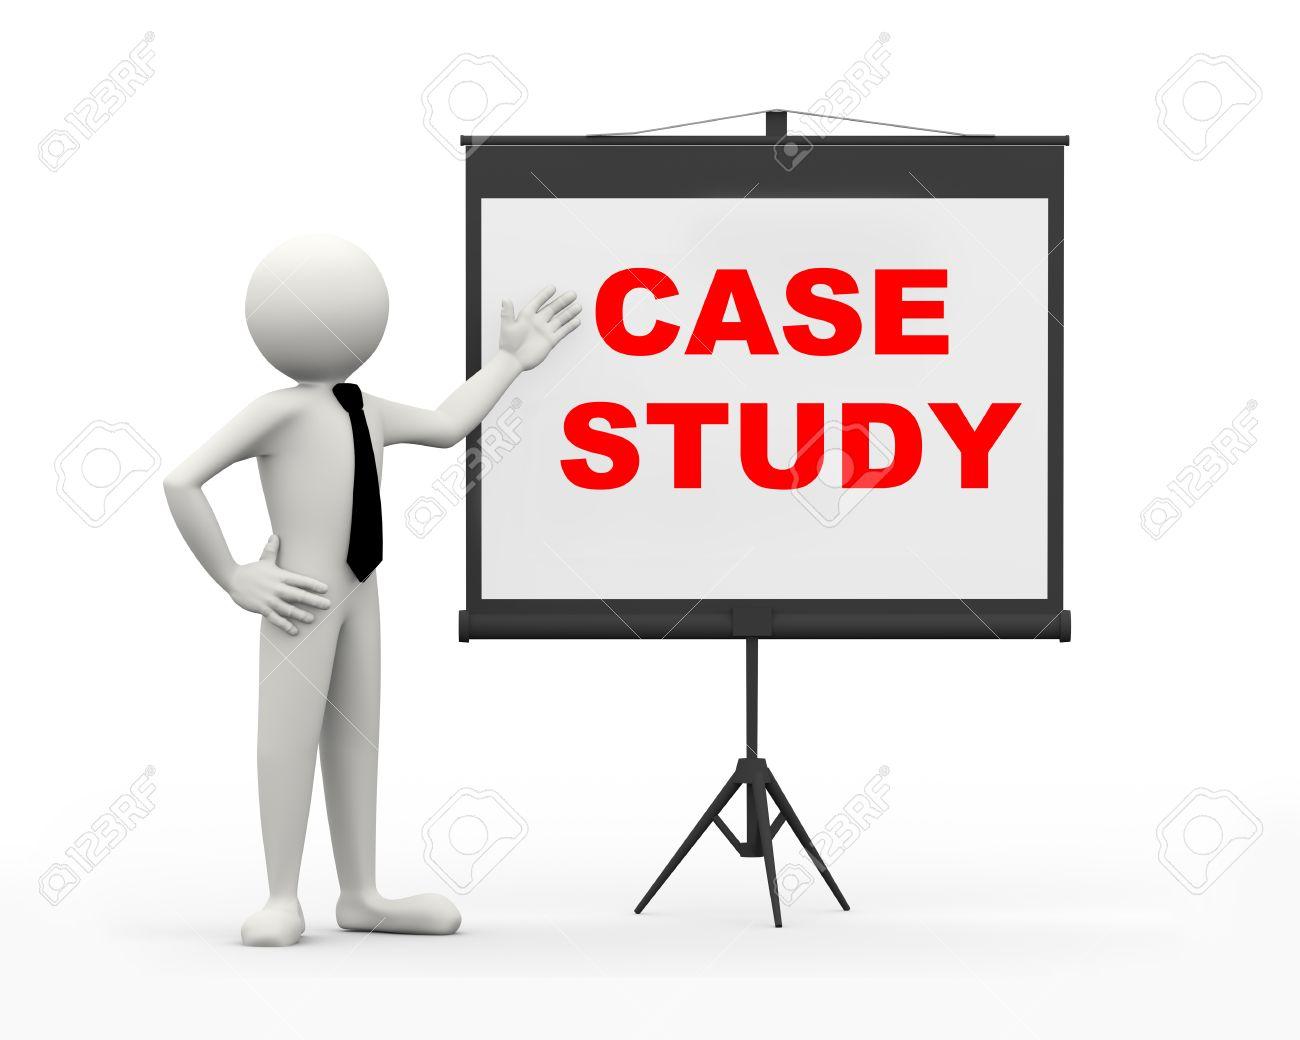 Presenting case studies